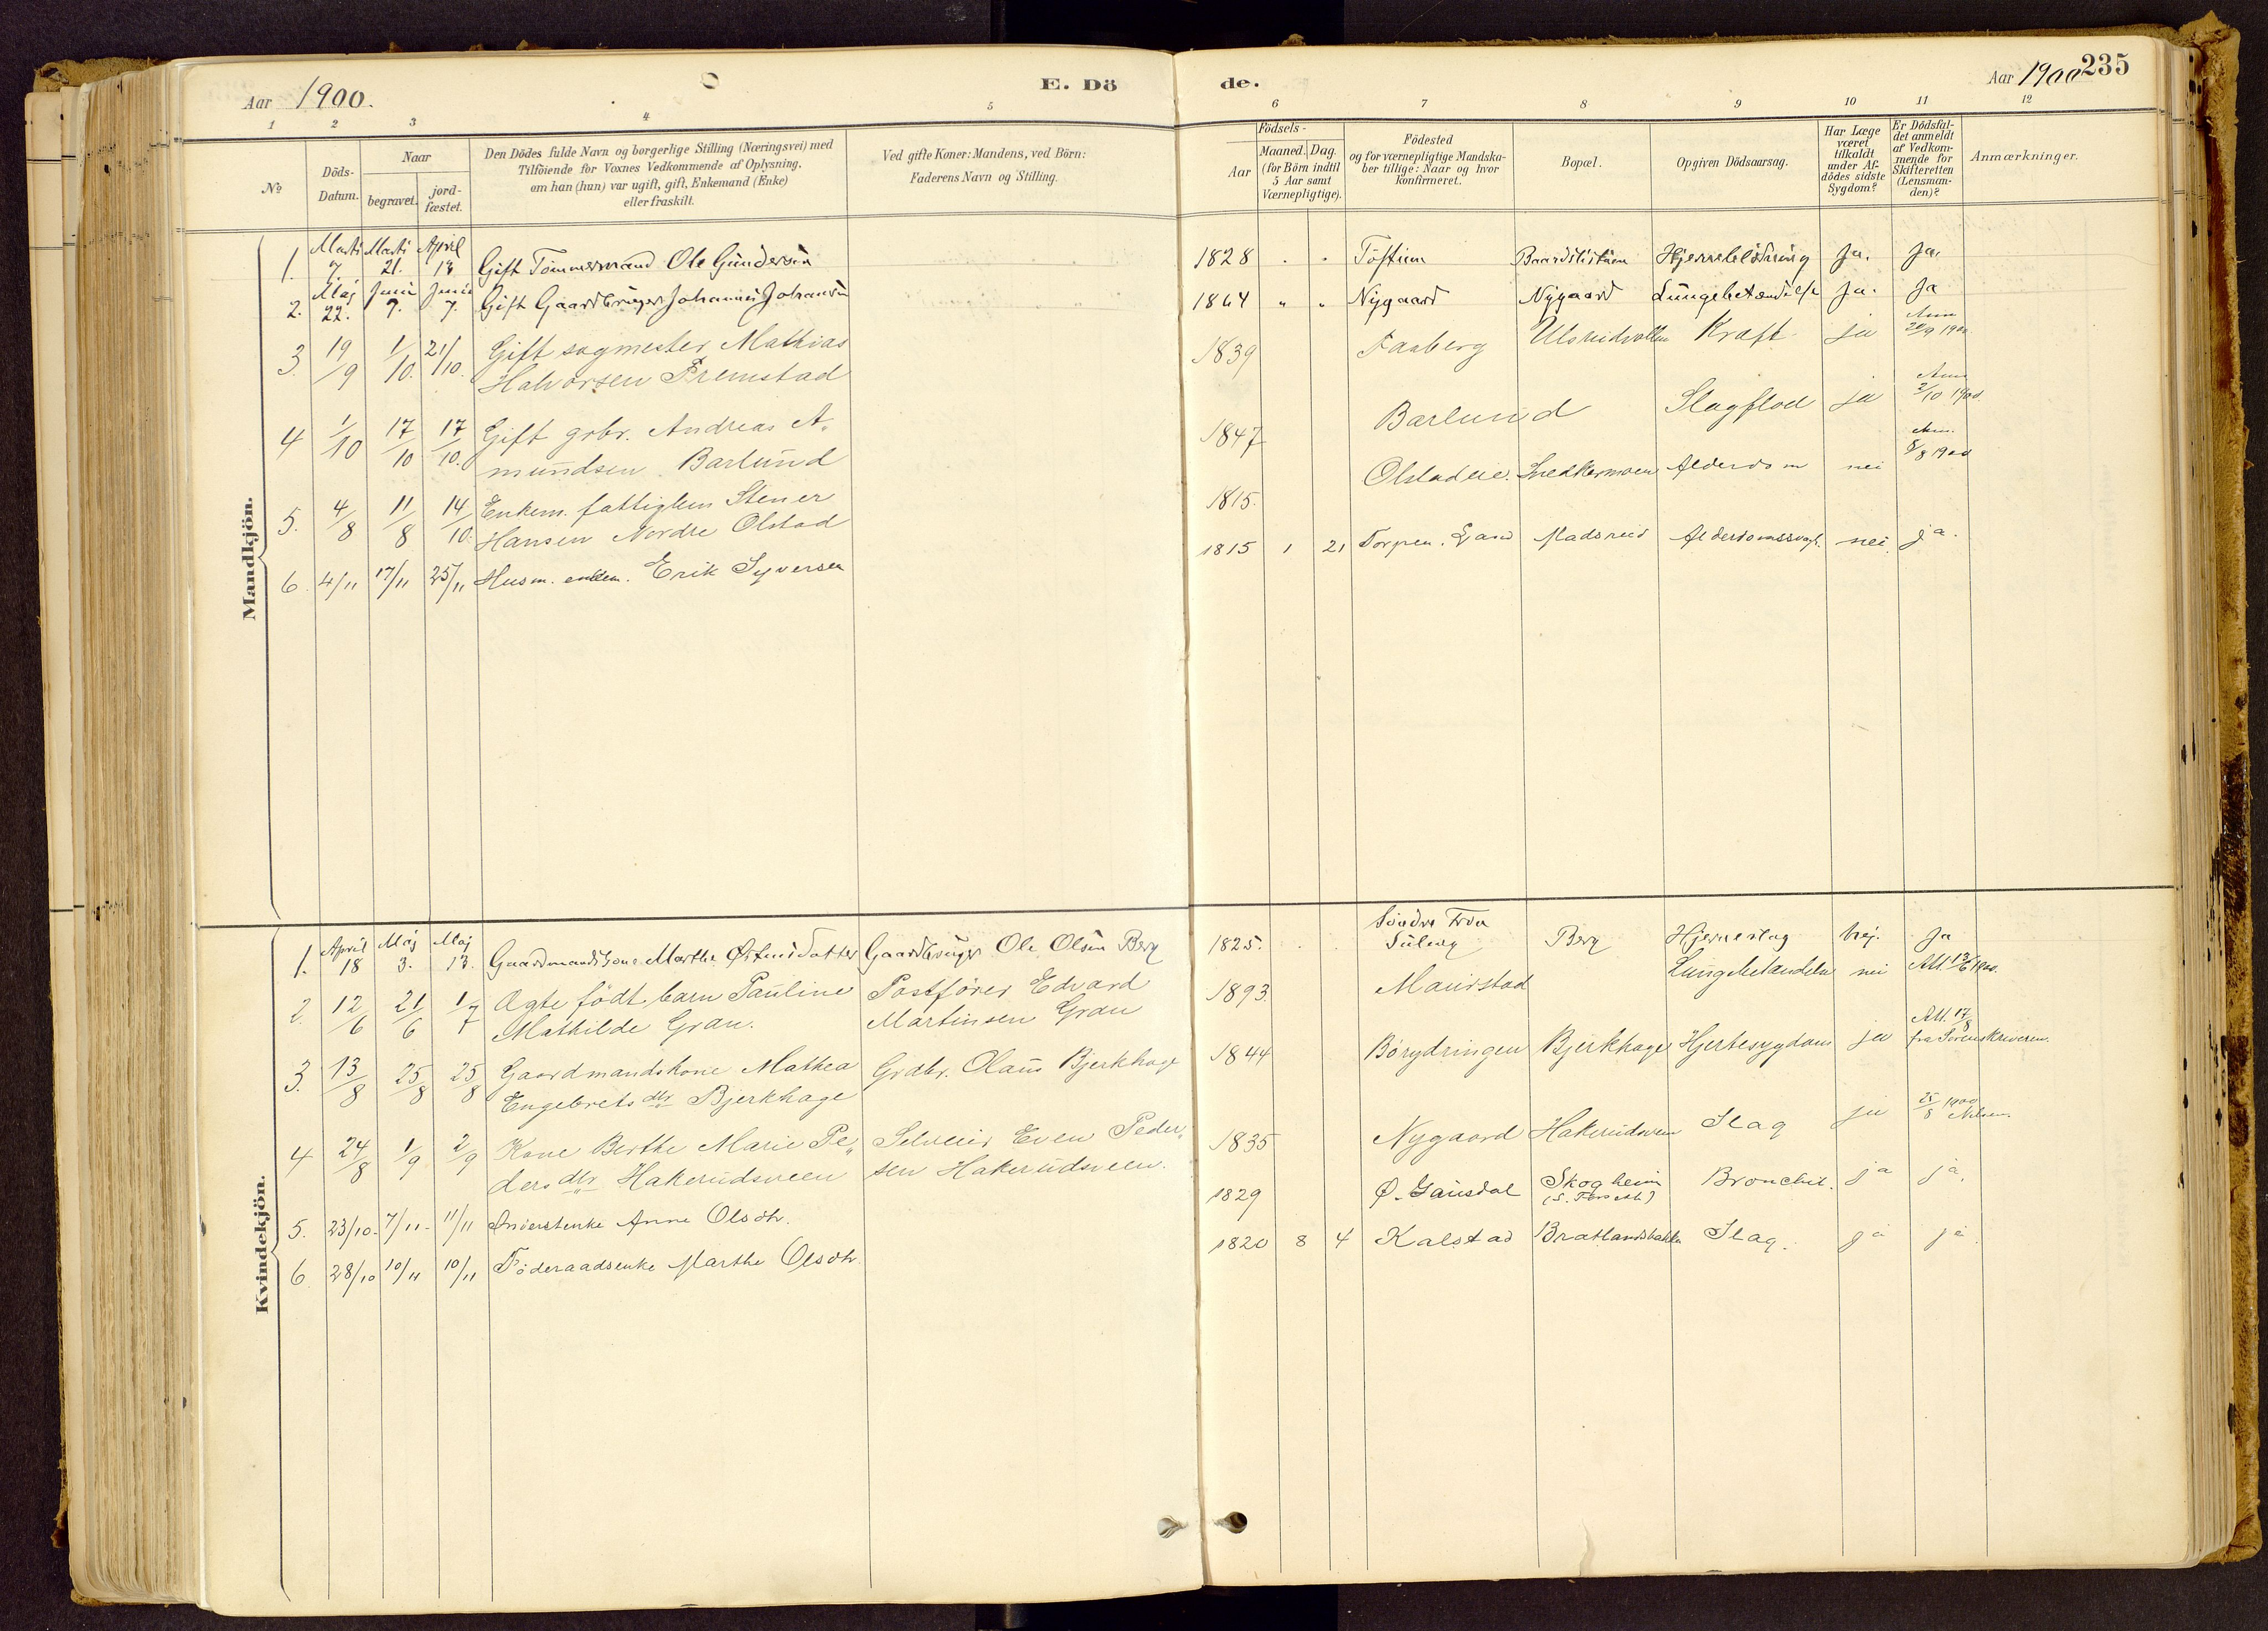 SAH, Vestre Gausdal prestekontor, Ministerialbok nr. 1, 1887-1914, s. 235